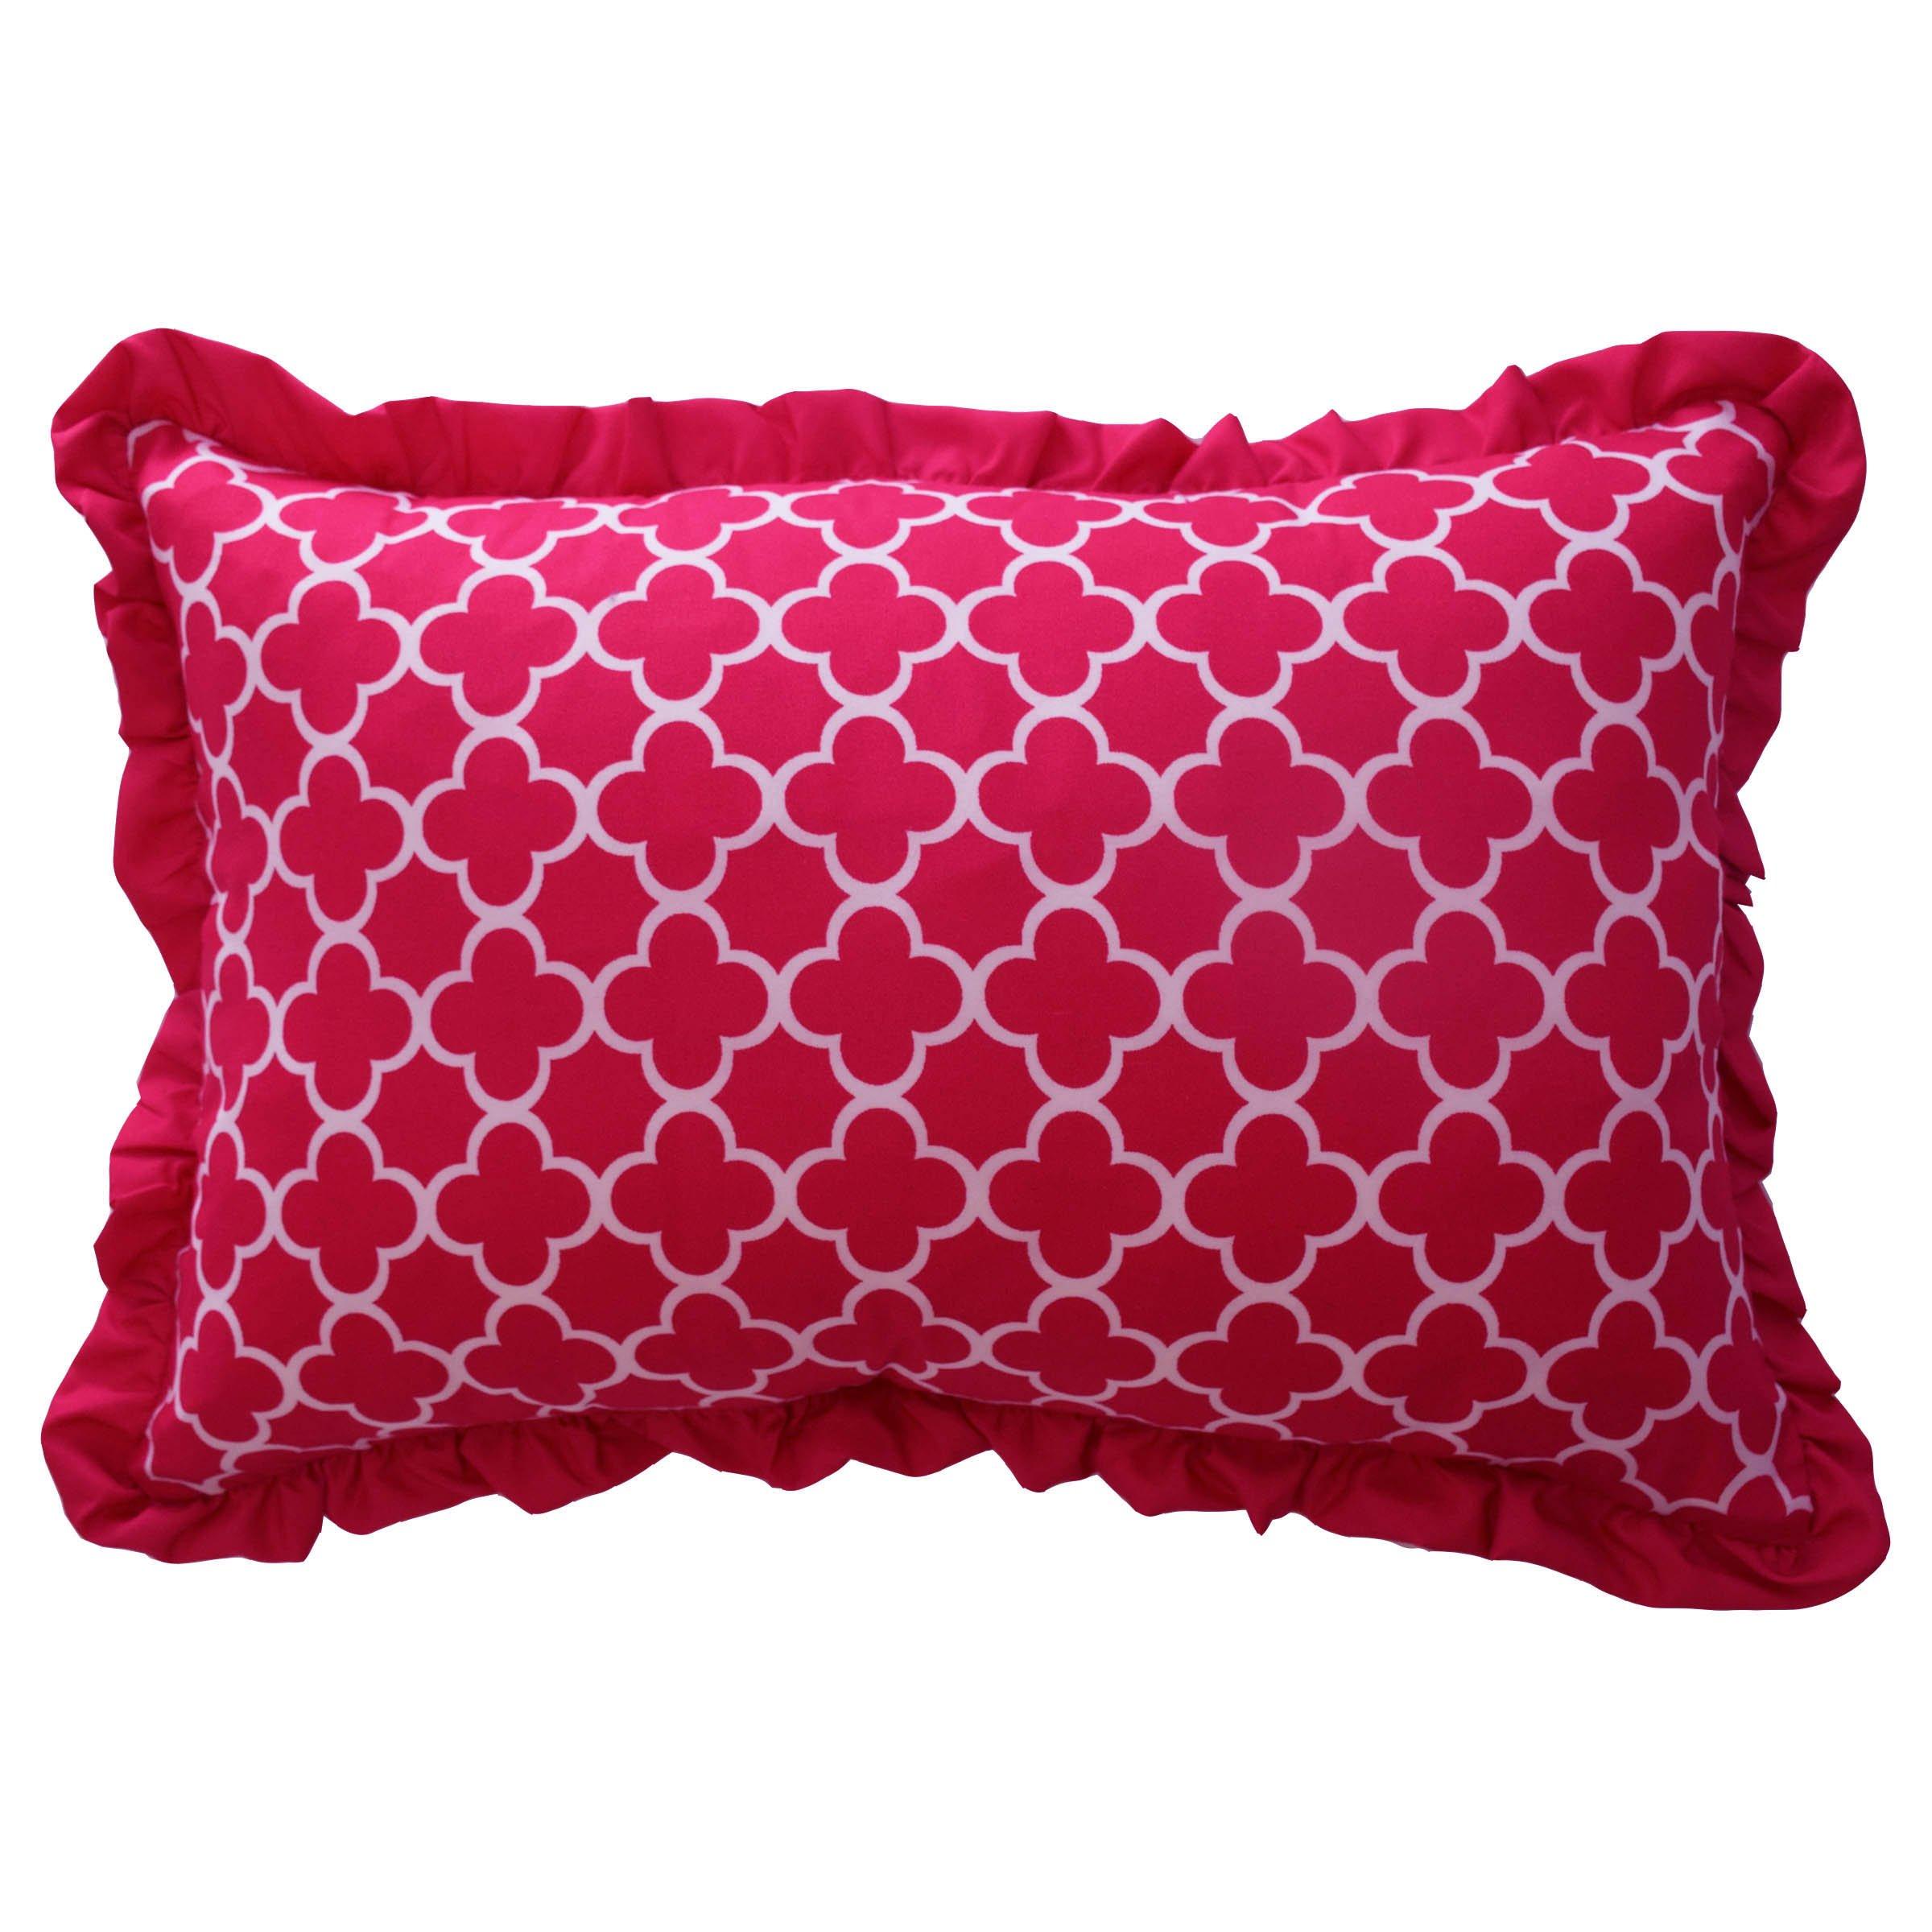 WAVERLY Kids Reverie Decorative Pillow, Pink, 12 x 18